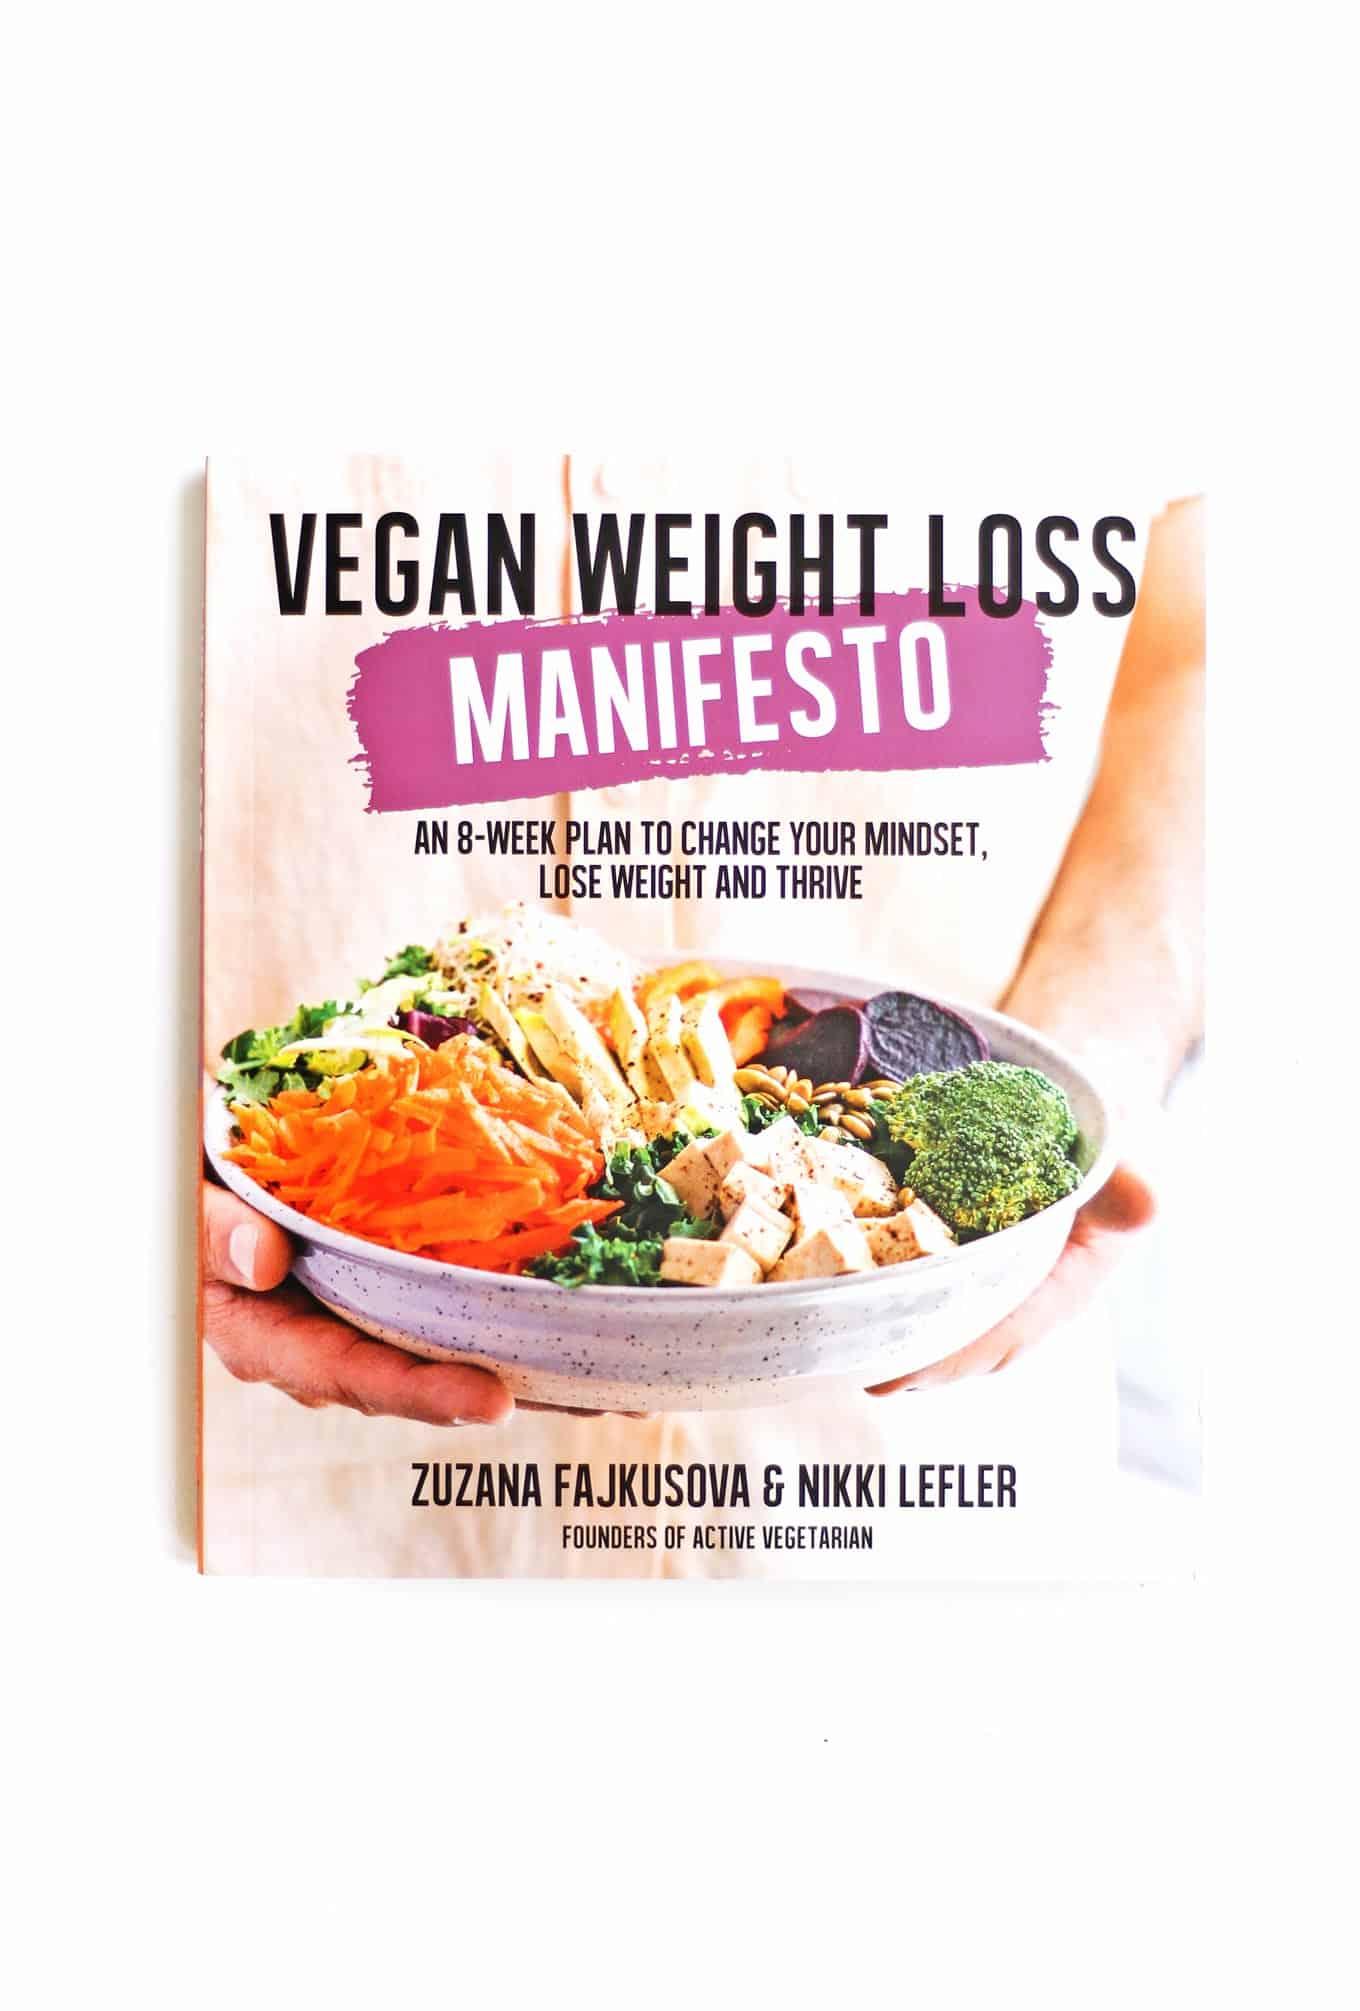 Vegan Weight Loss Manifesto cookbook